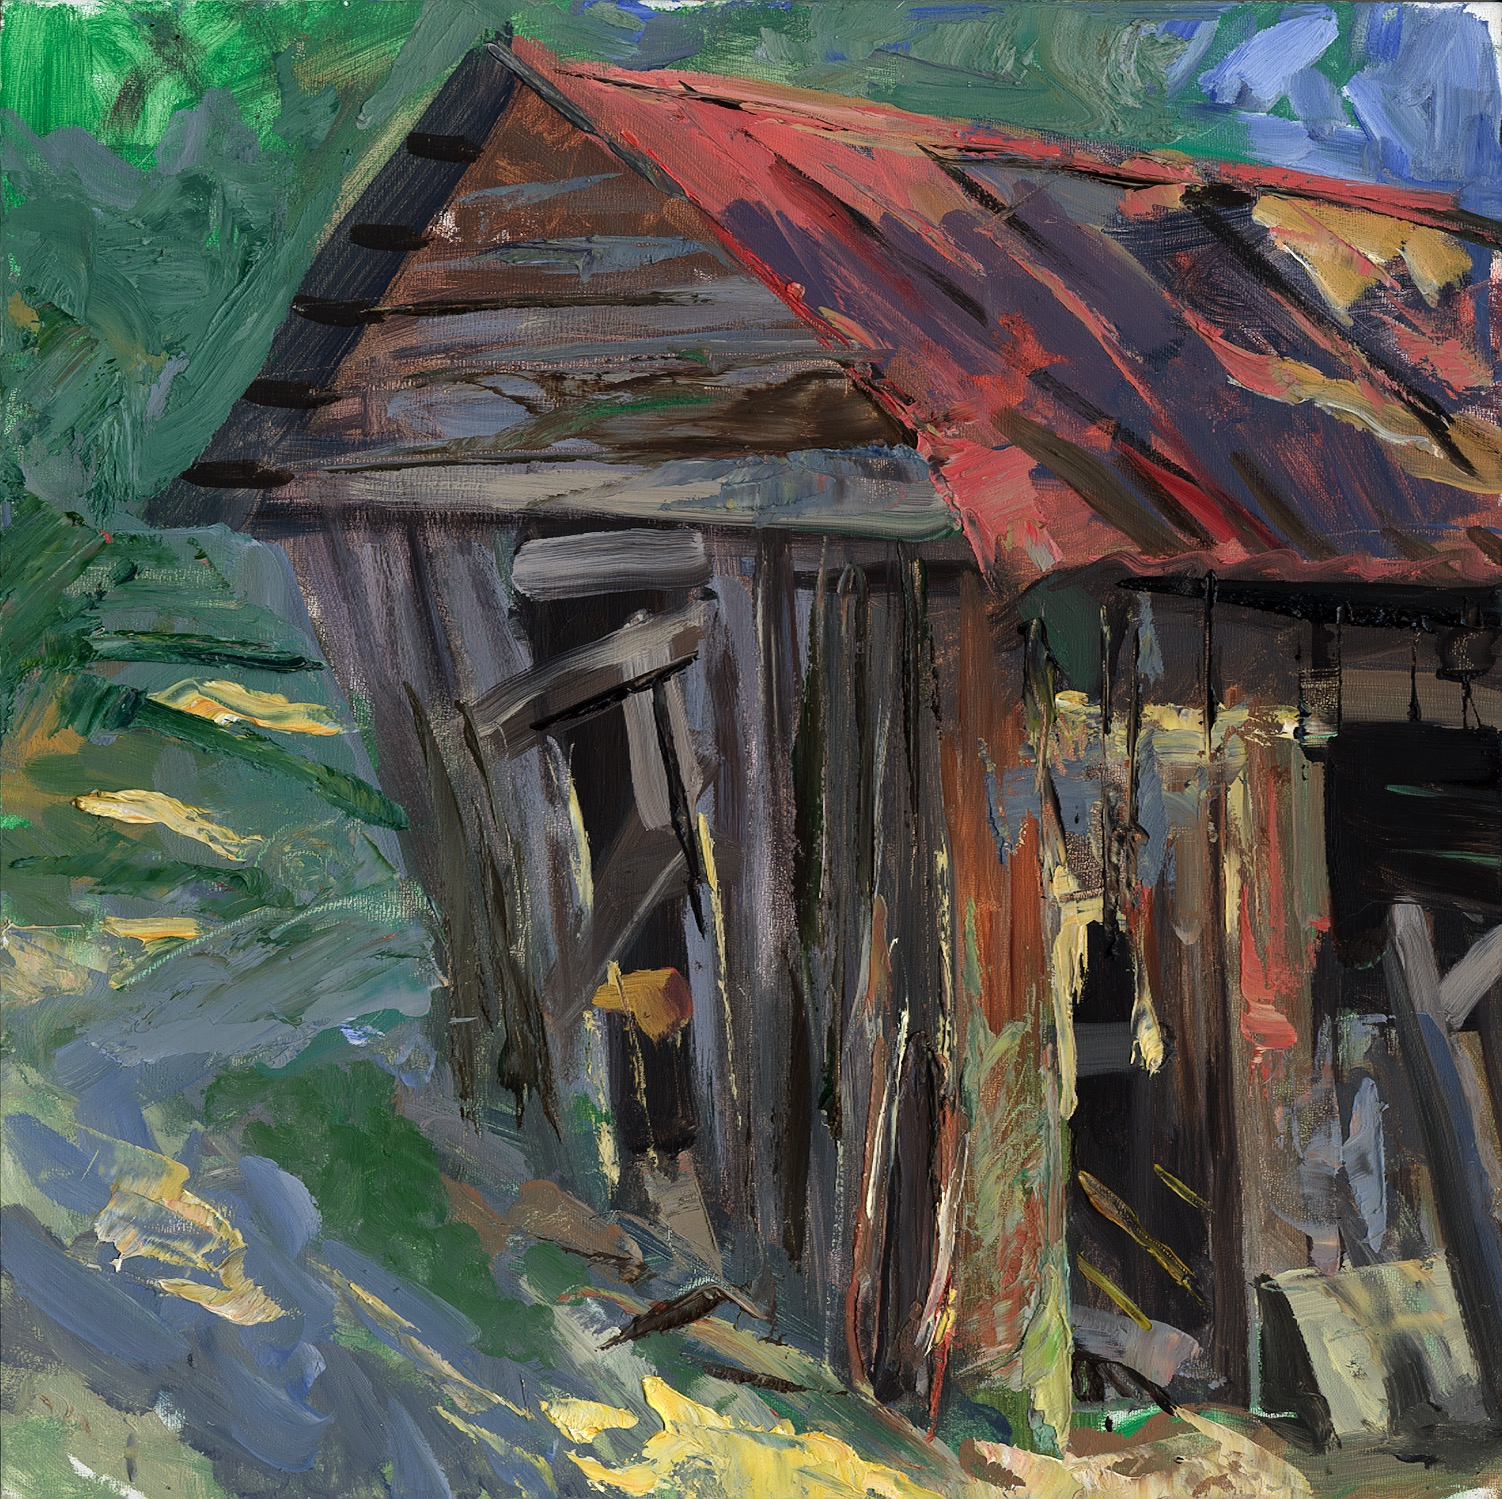 Bryan's Barn 2 - Oil - 12 x 12.jpg